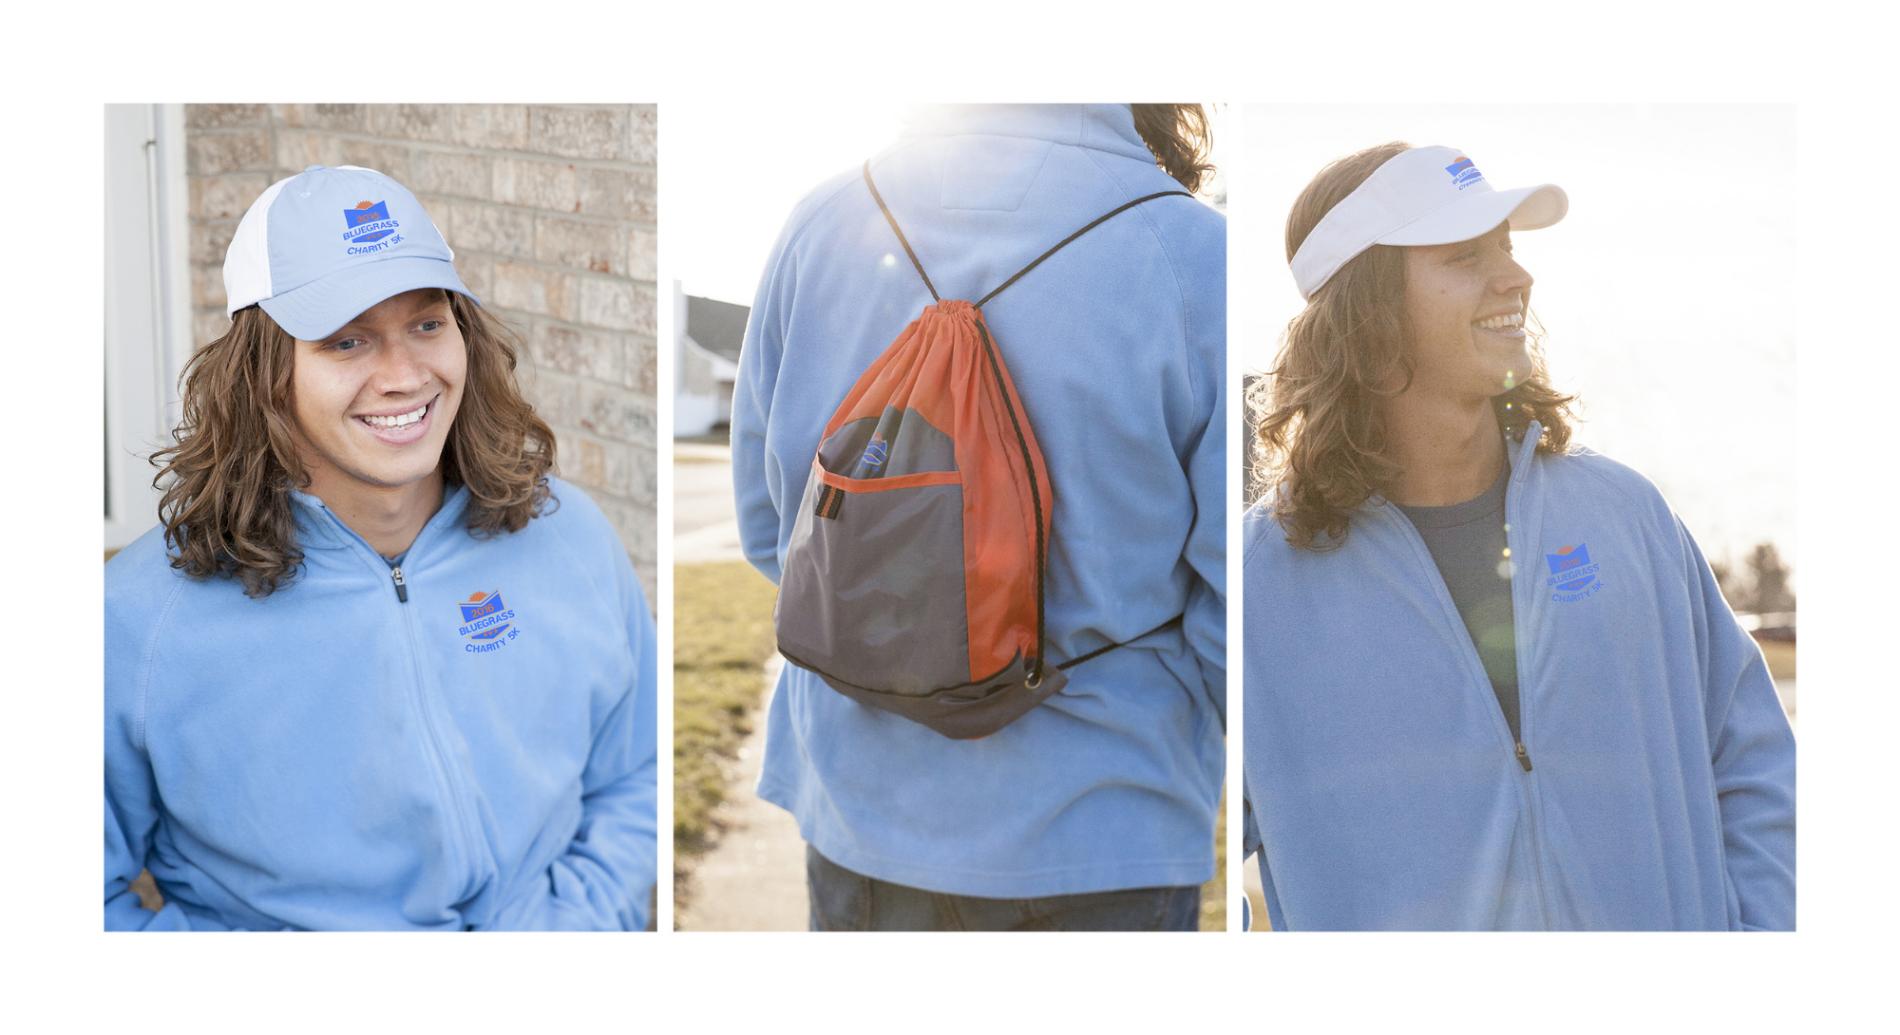 Cap: Style 0442 in Slate Blue; Visor: Style 4324 in White; Jacket: Style1706 in Sport Light Blue; Shirt: Style 1615 in Lake; Cinch Bag: Style 1221 in Pop Orange/Deep Smoke.